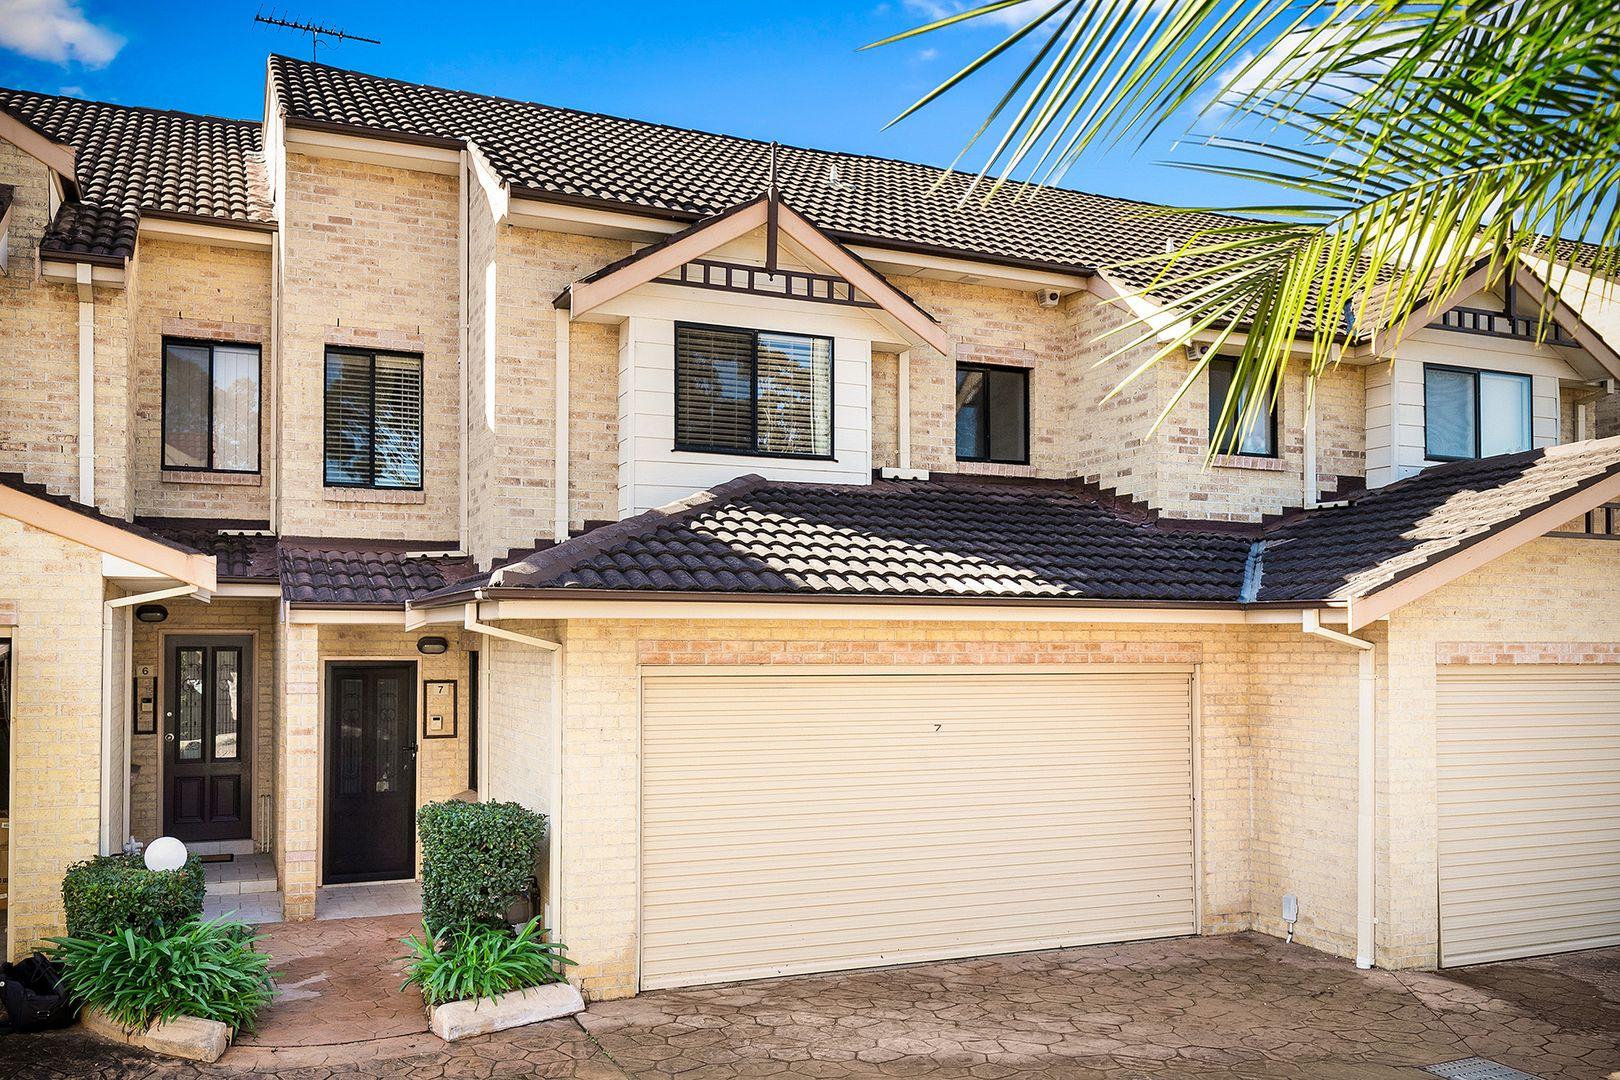 7/4-8 Russell Street, Baulkham Hills NSW 2153, Image 0